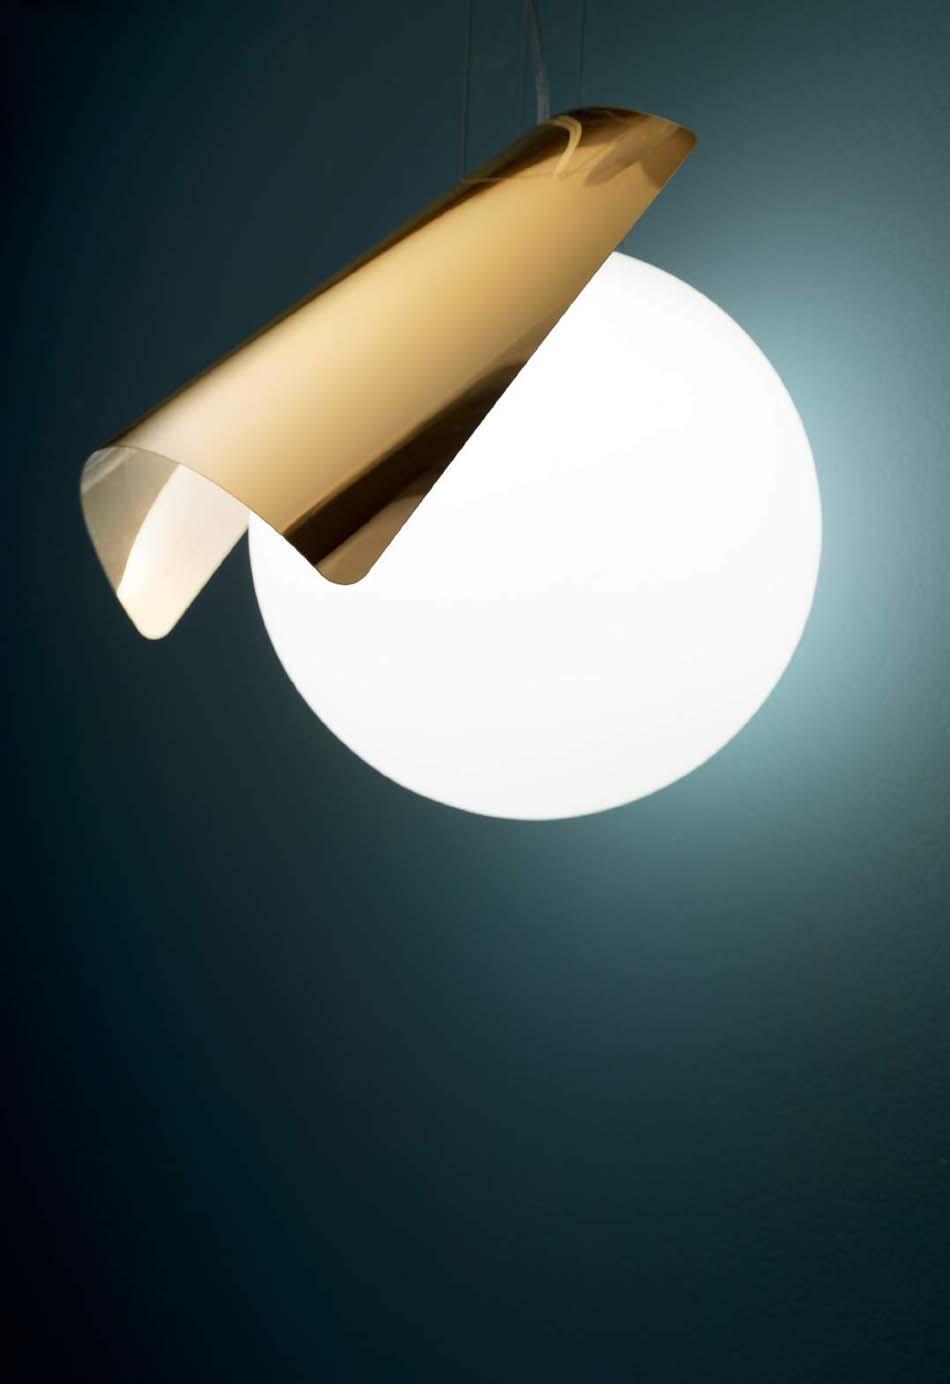 Lampade sospensione Ideal Lux penombra – Bruni Arredamenti